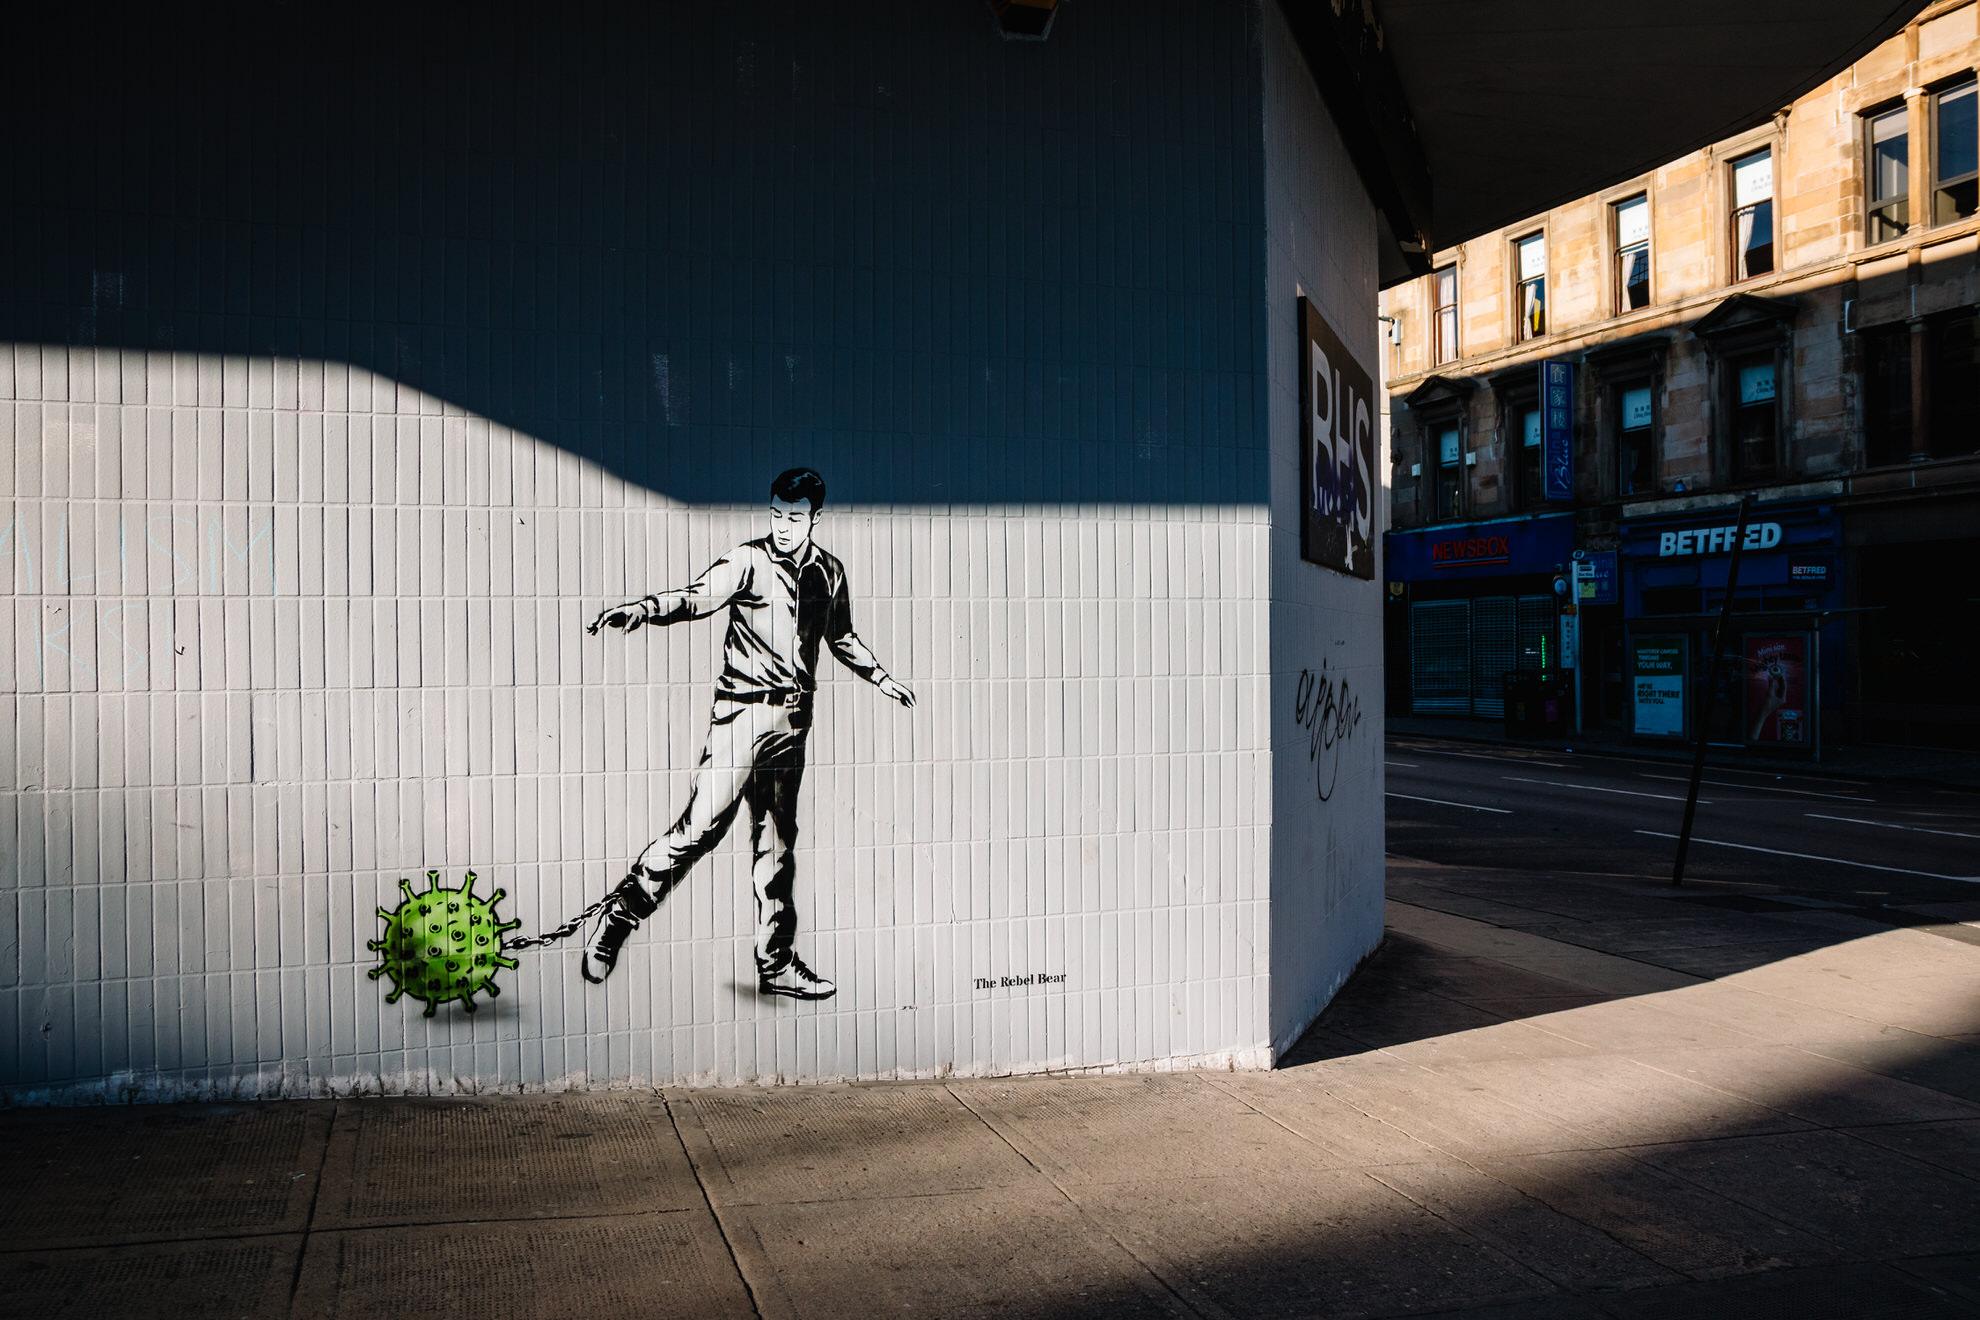 COVID-19 graffiti art by the Revel Bear in Glasgow